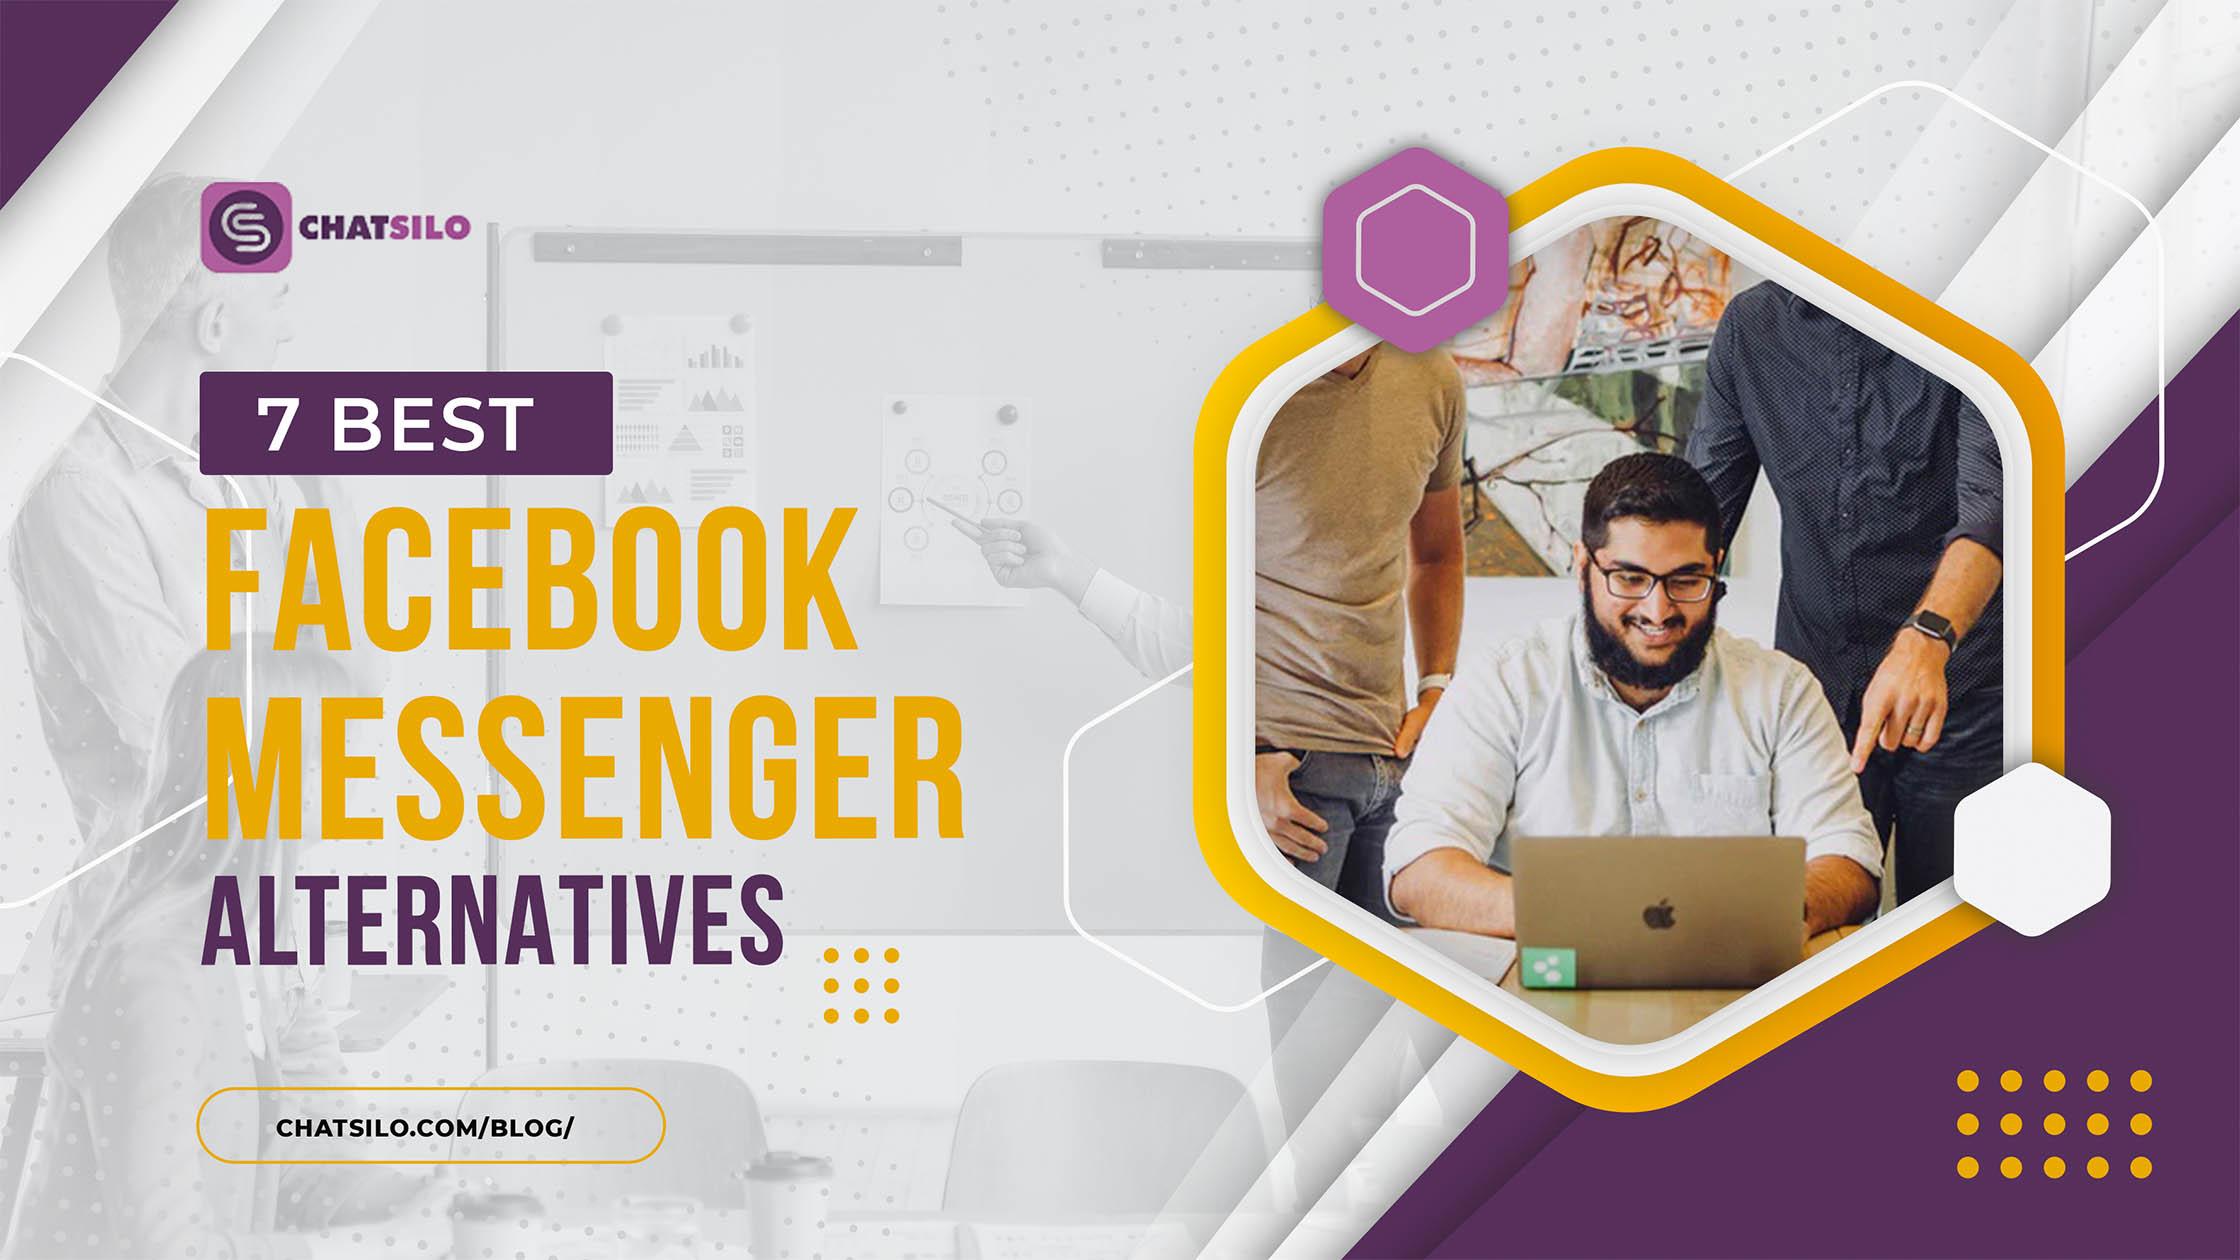 7 Best Facebook Messenger Alternatives of 2020